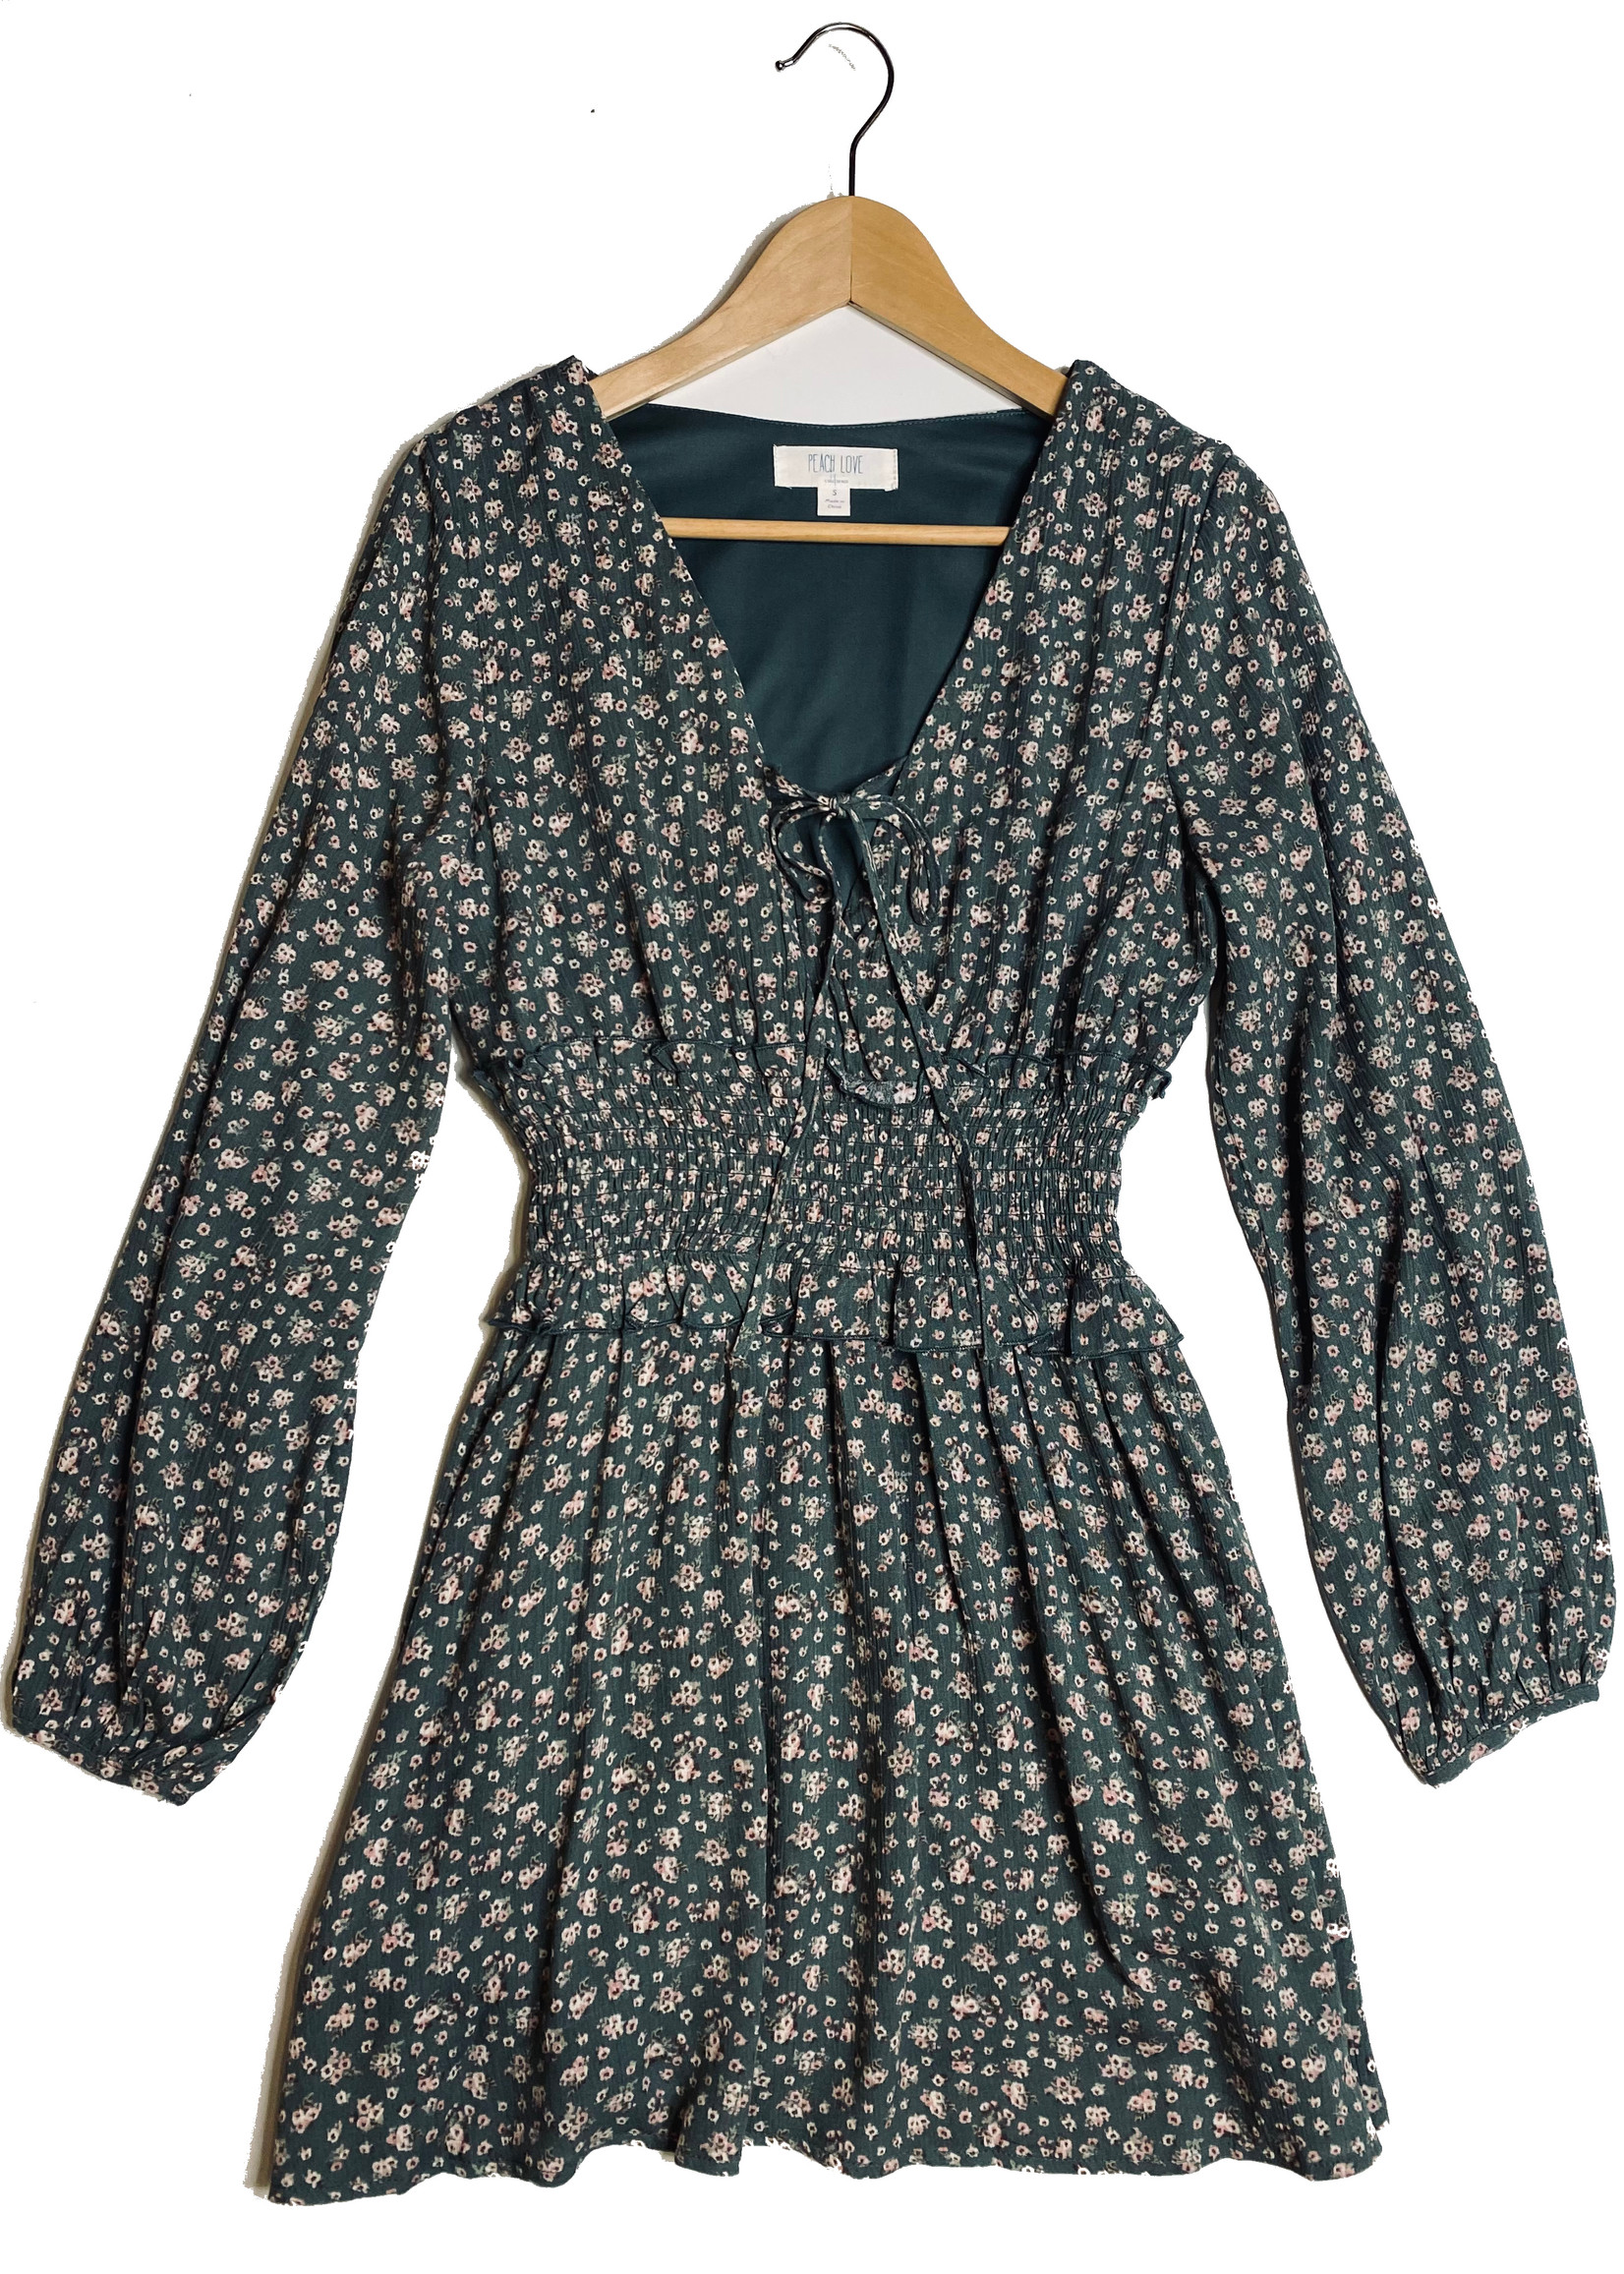 Long Sleeve Smocked Waist Dress - Sage